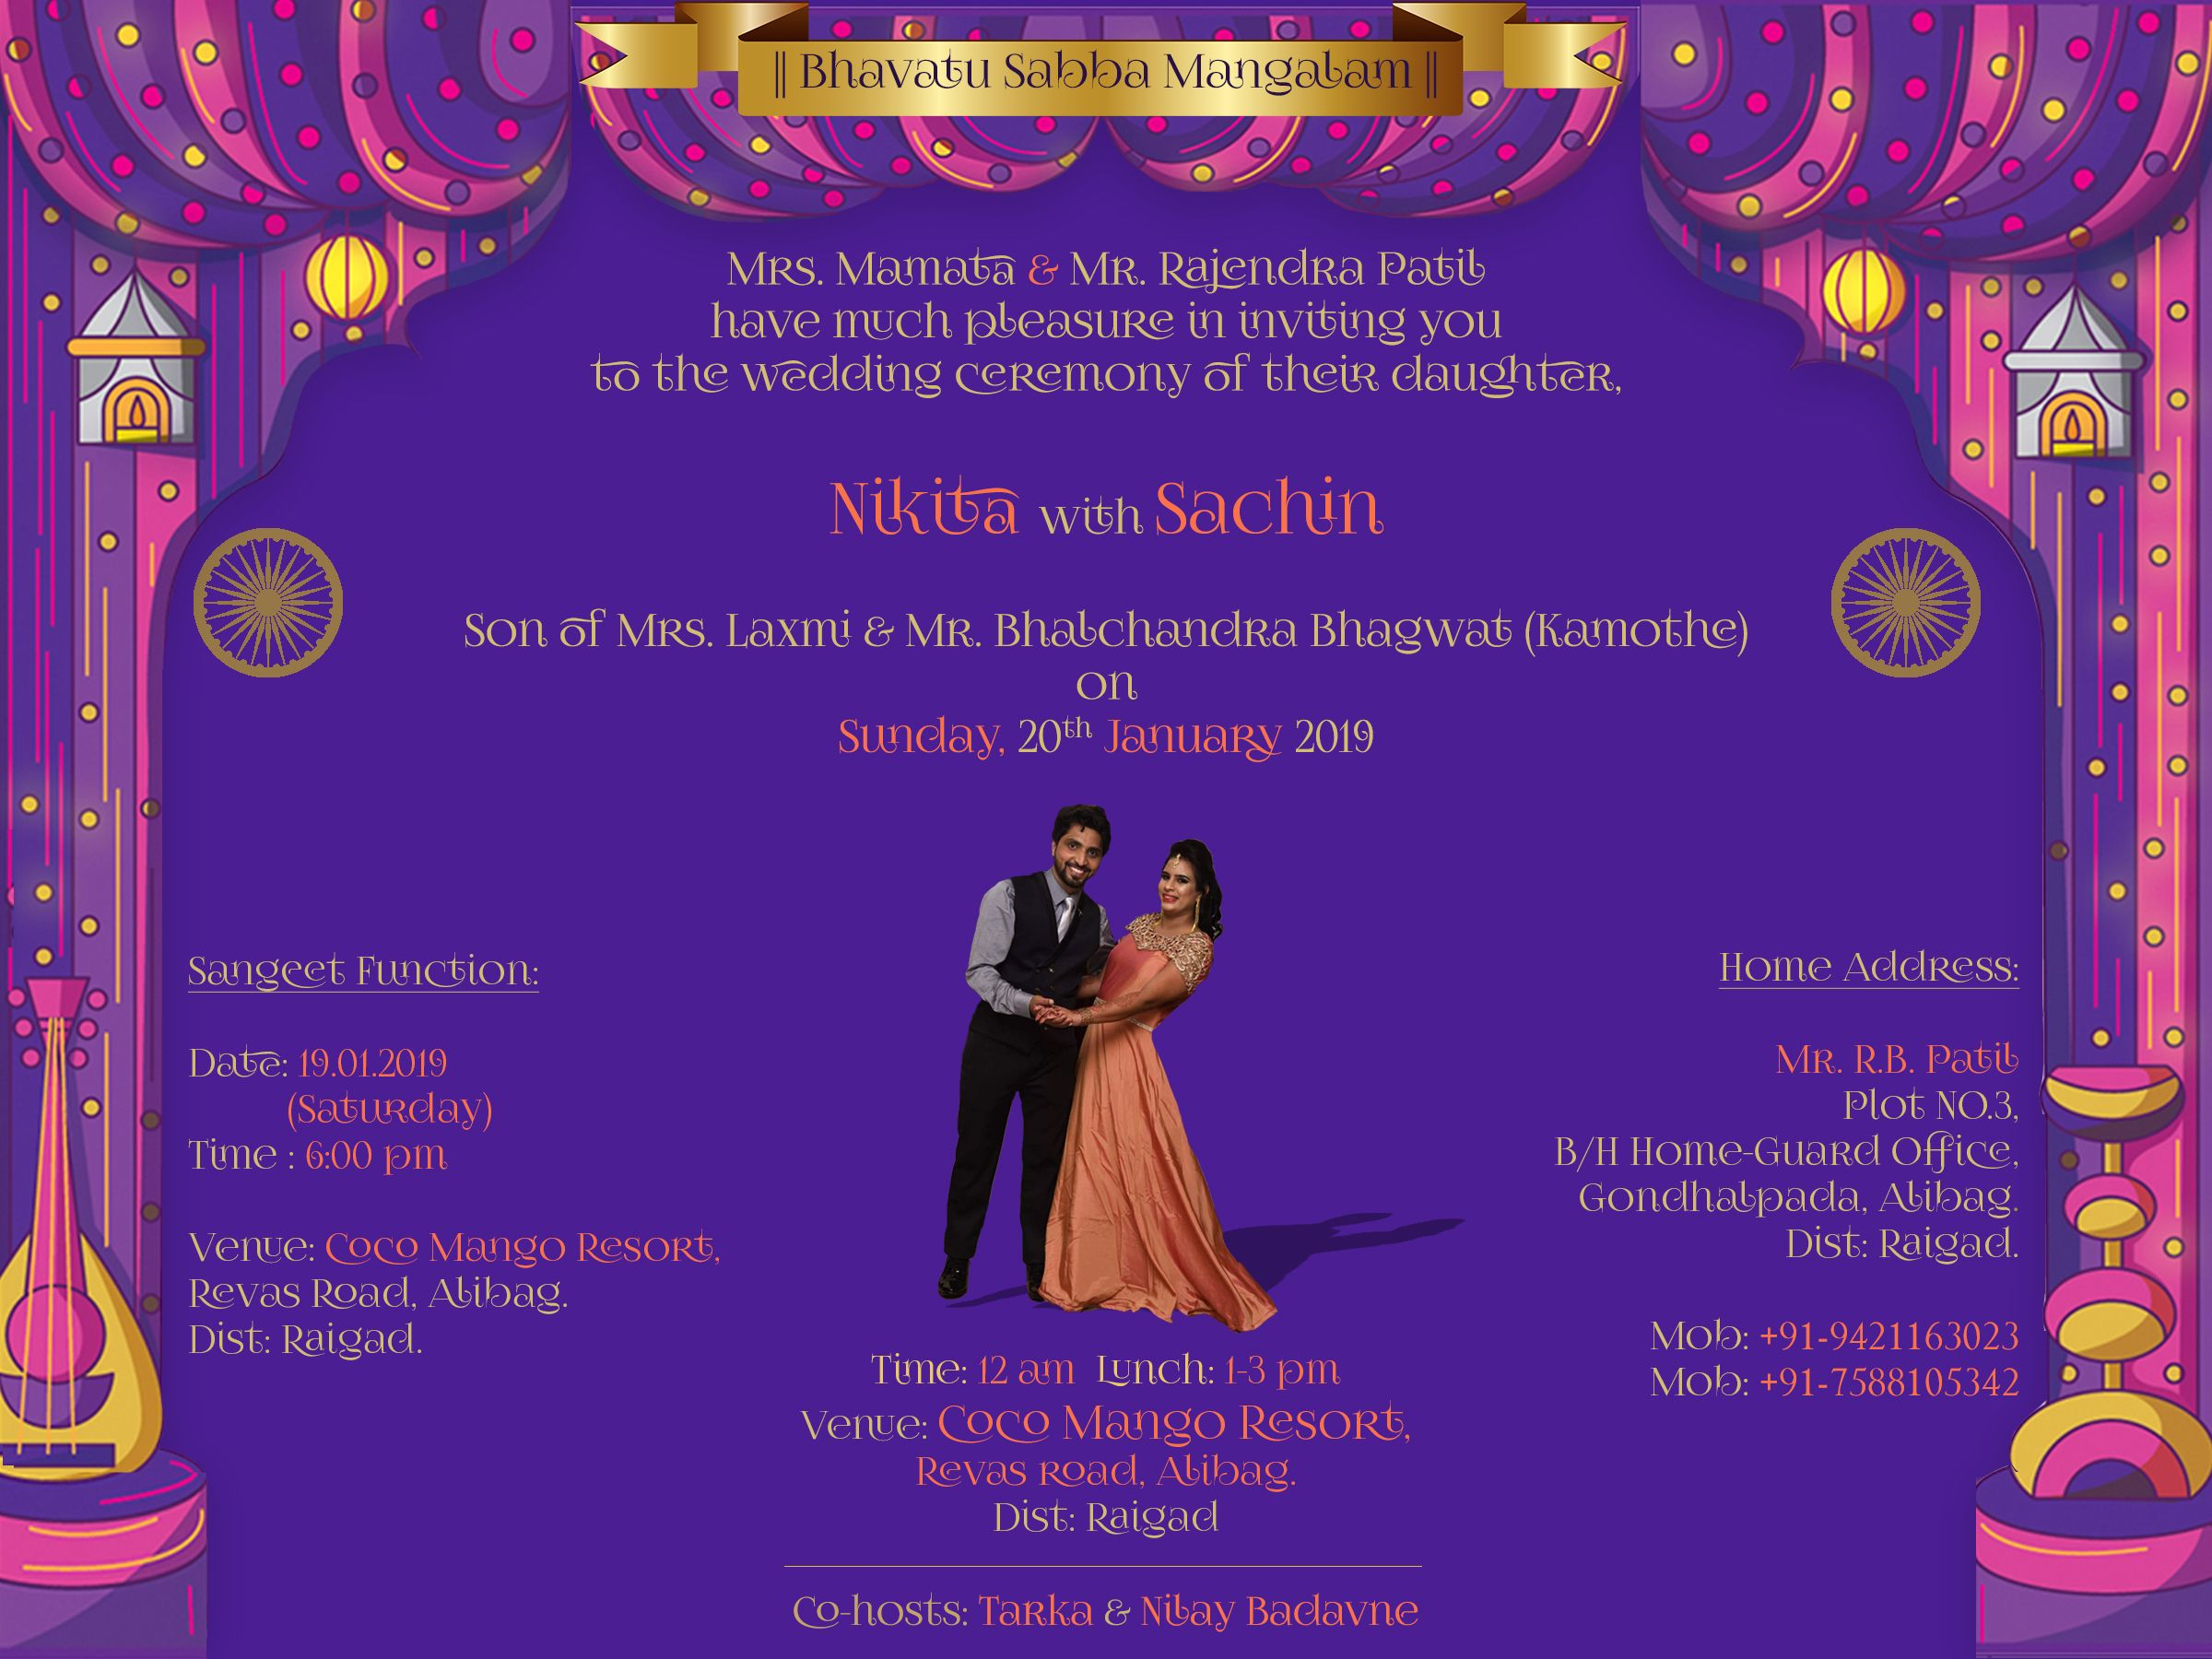 Wedding Invite Wedding Card Design Invitation Card Design Wedding Cards